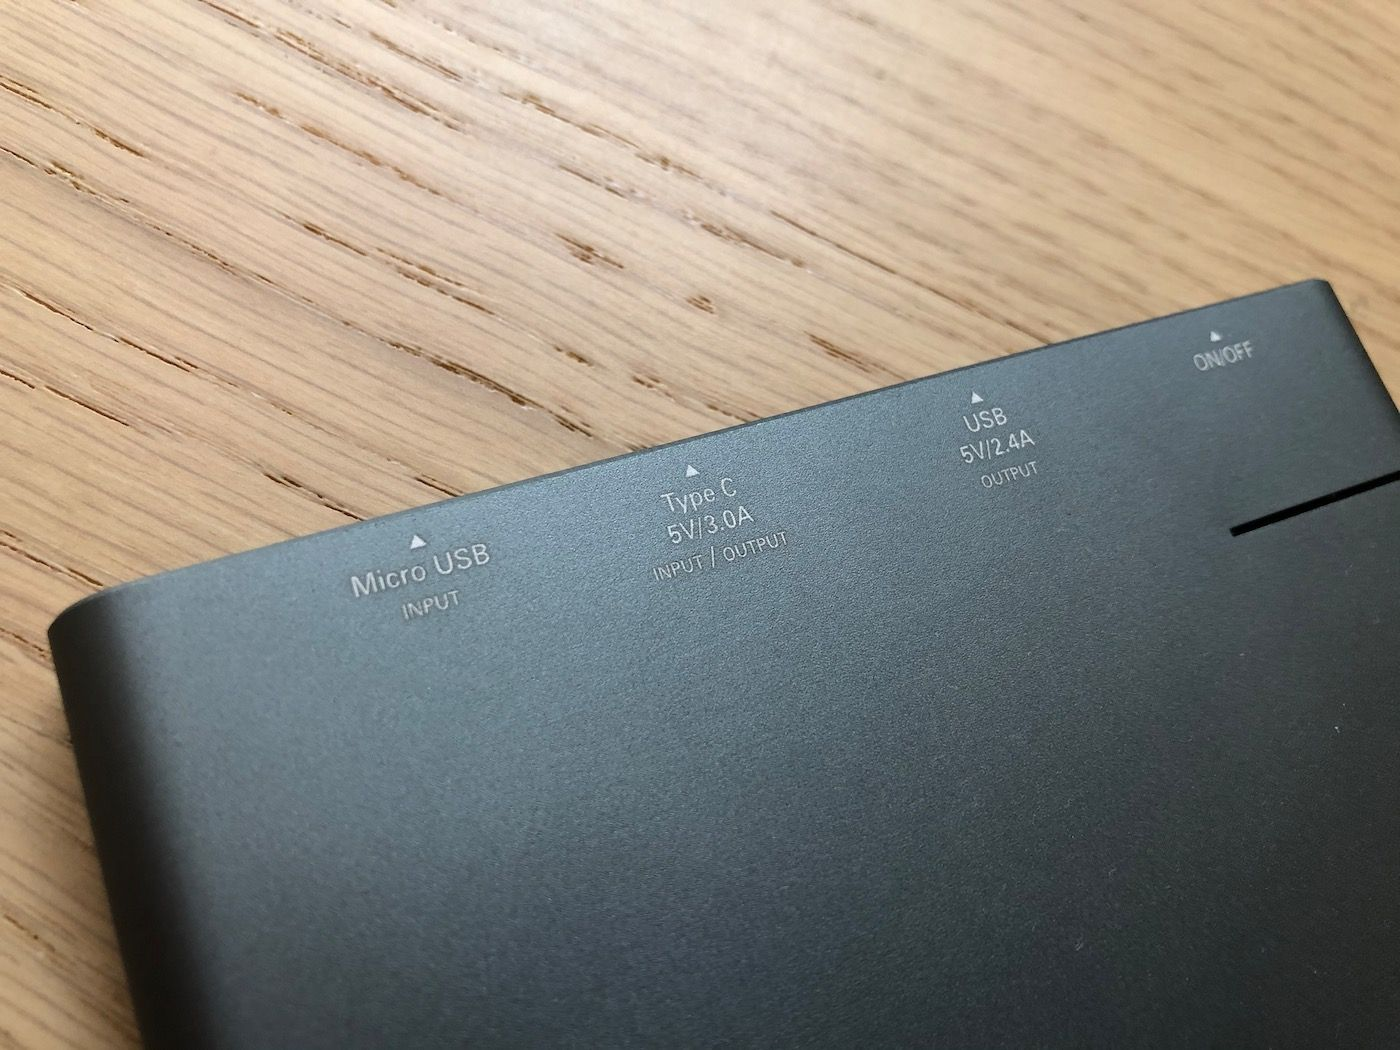 Varta PowerBank Slim 12000mAh ports